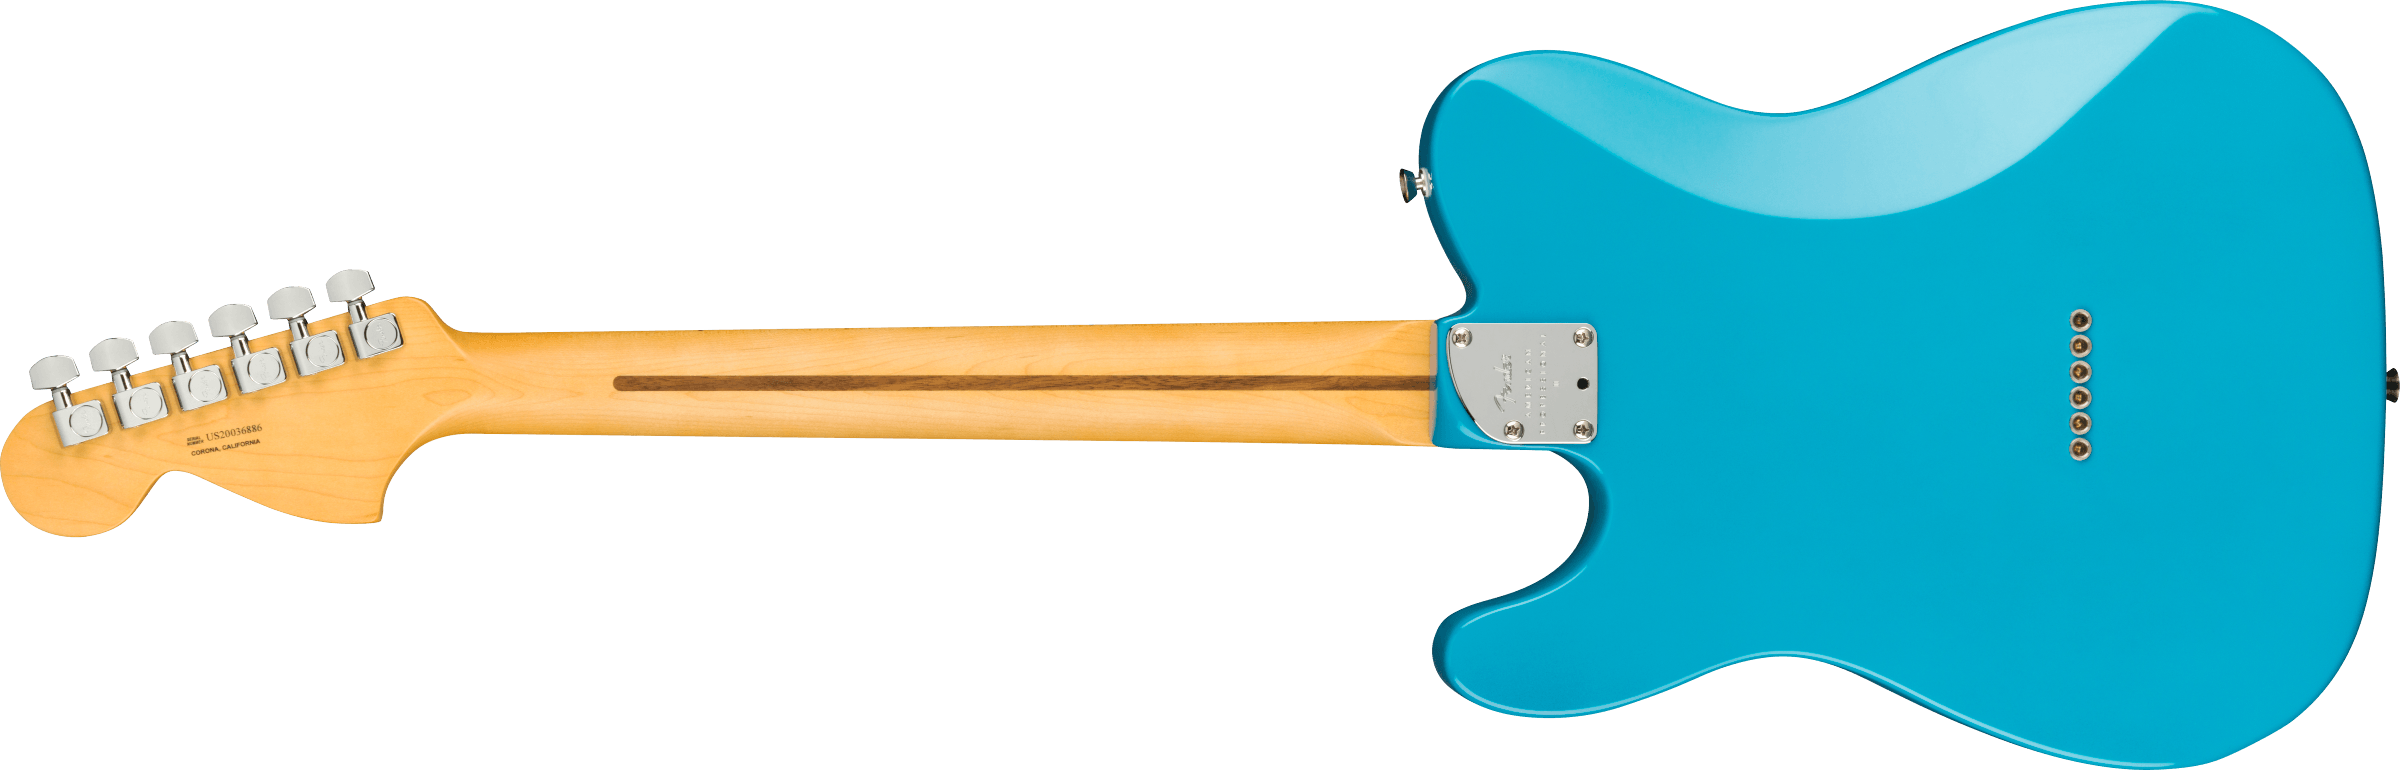 Fender American Professional II Telecaster® Deluxe, Maple Fingerboard, Miami Blue